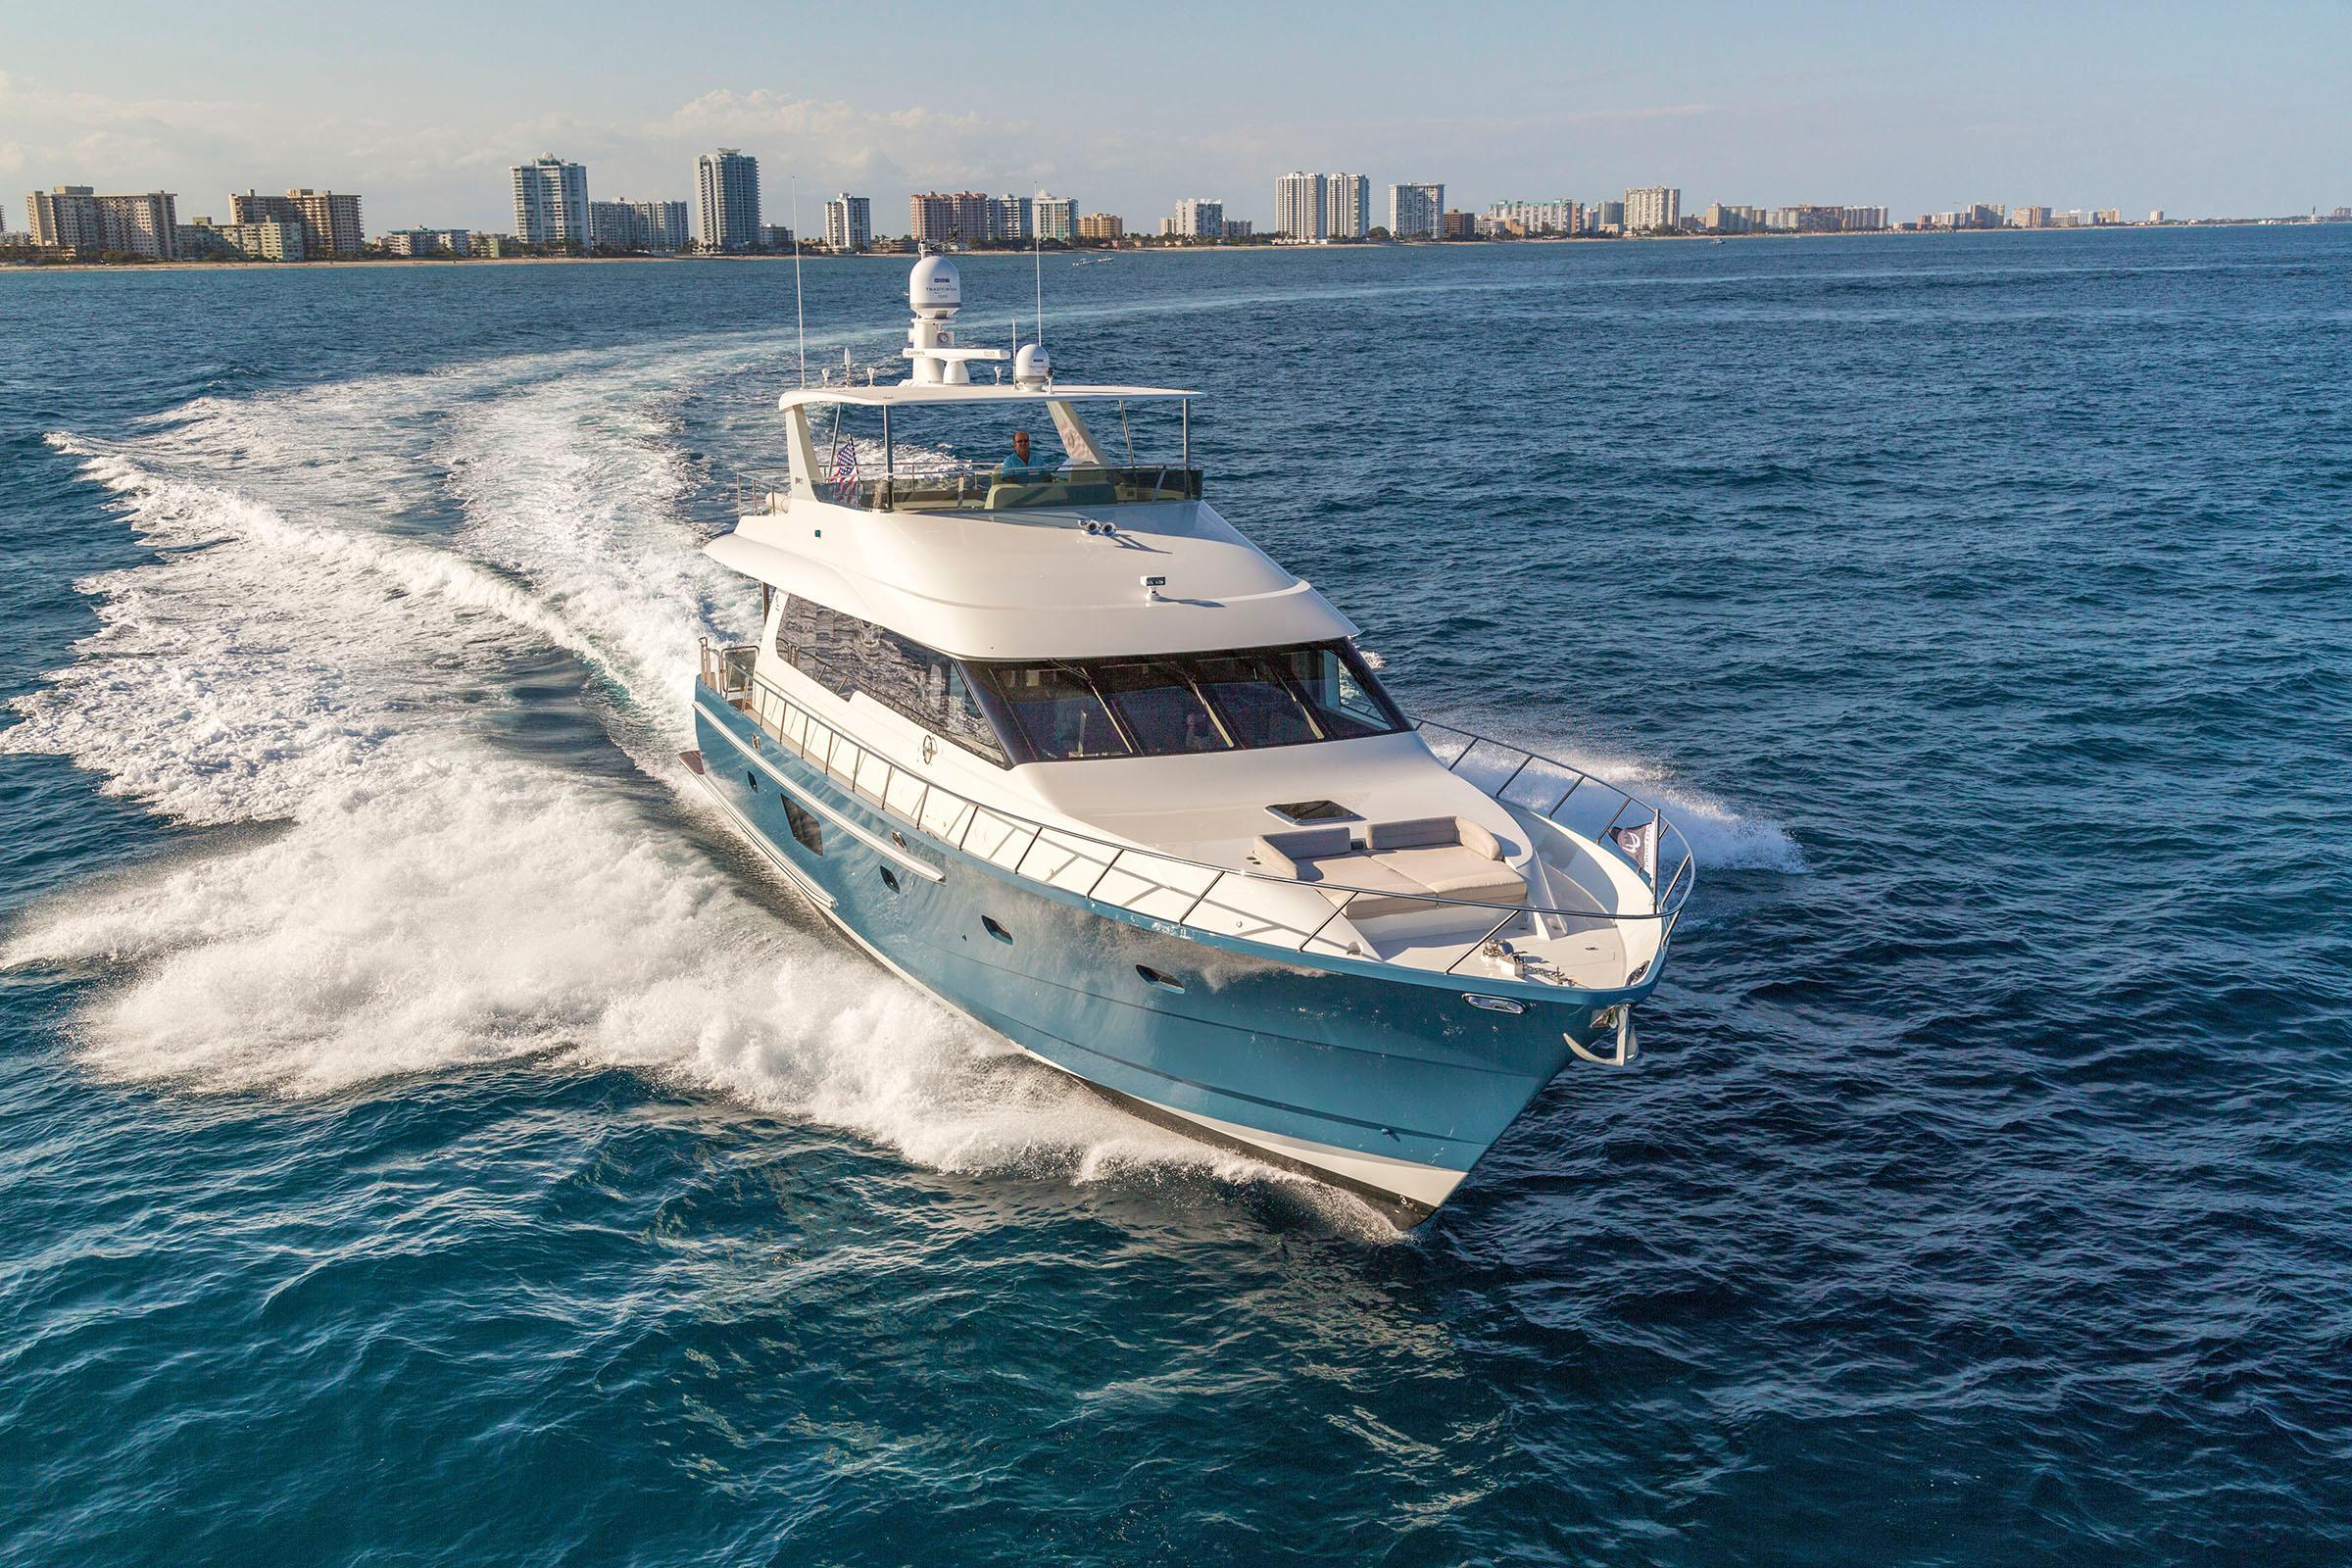 2017 Cheoy Lee Bravo 72 Power Boat For Sale Wwwyachtworldcom